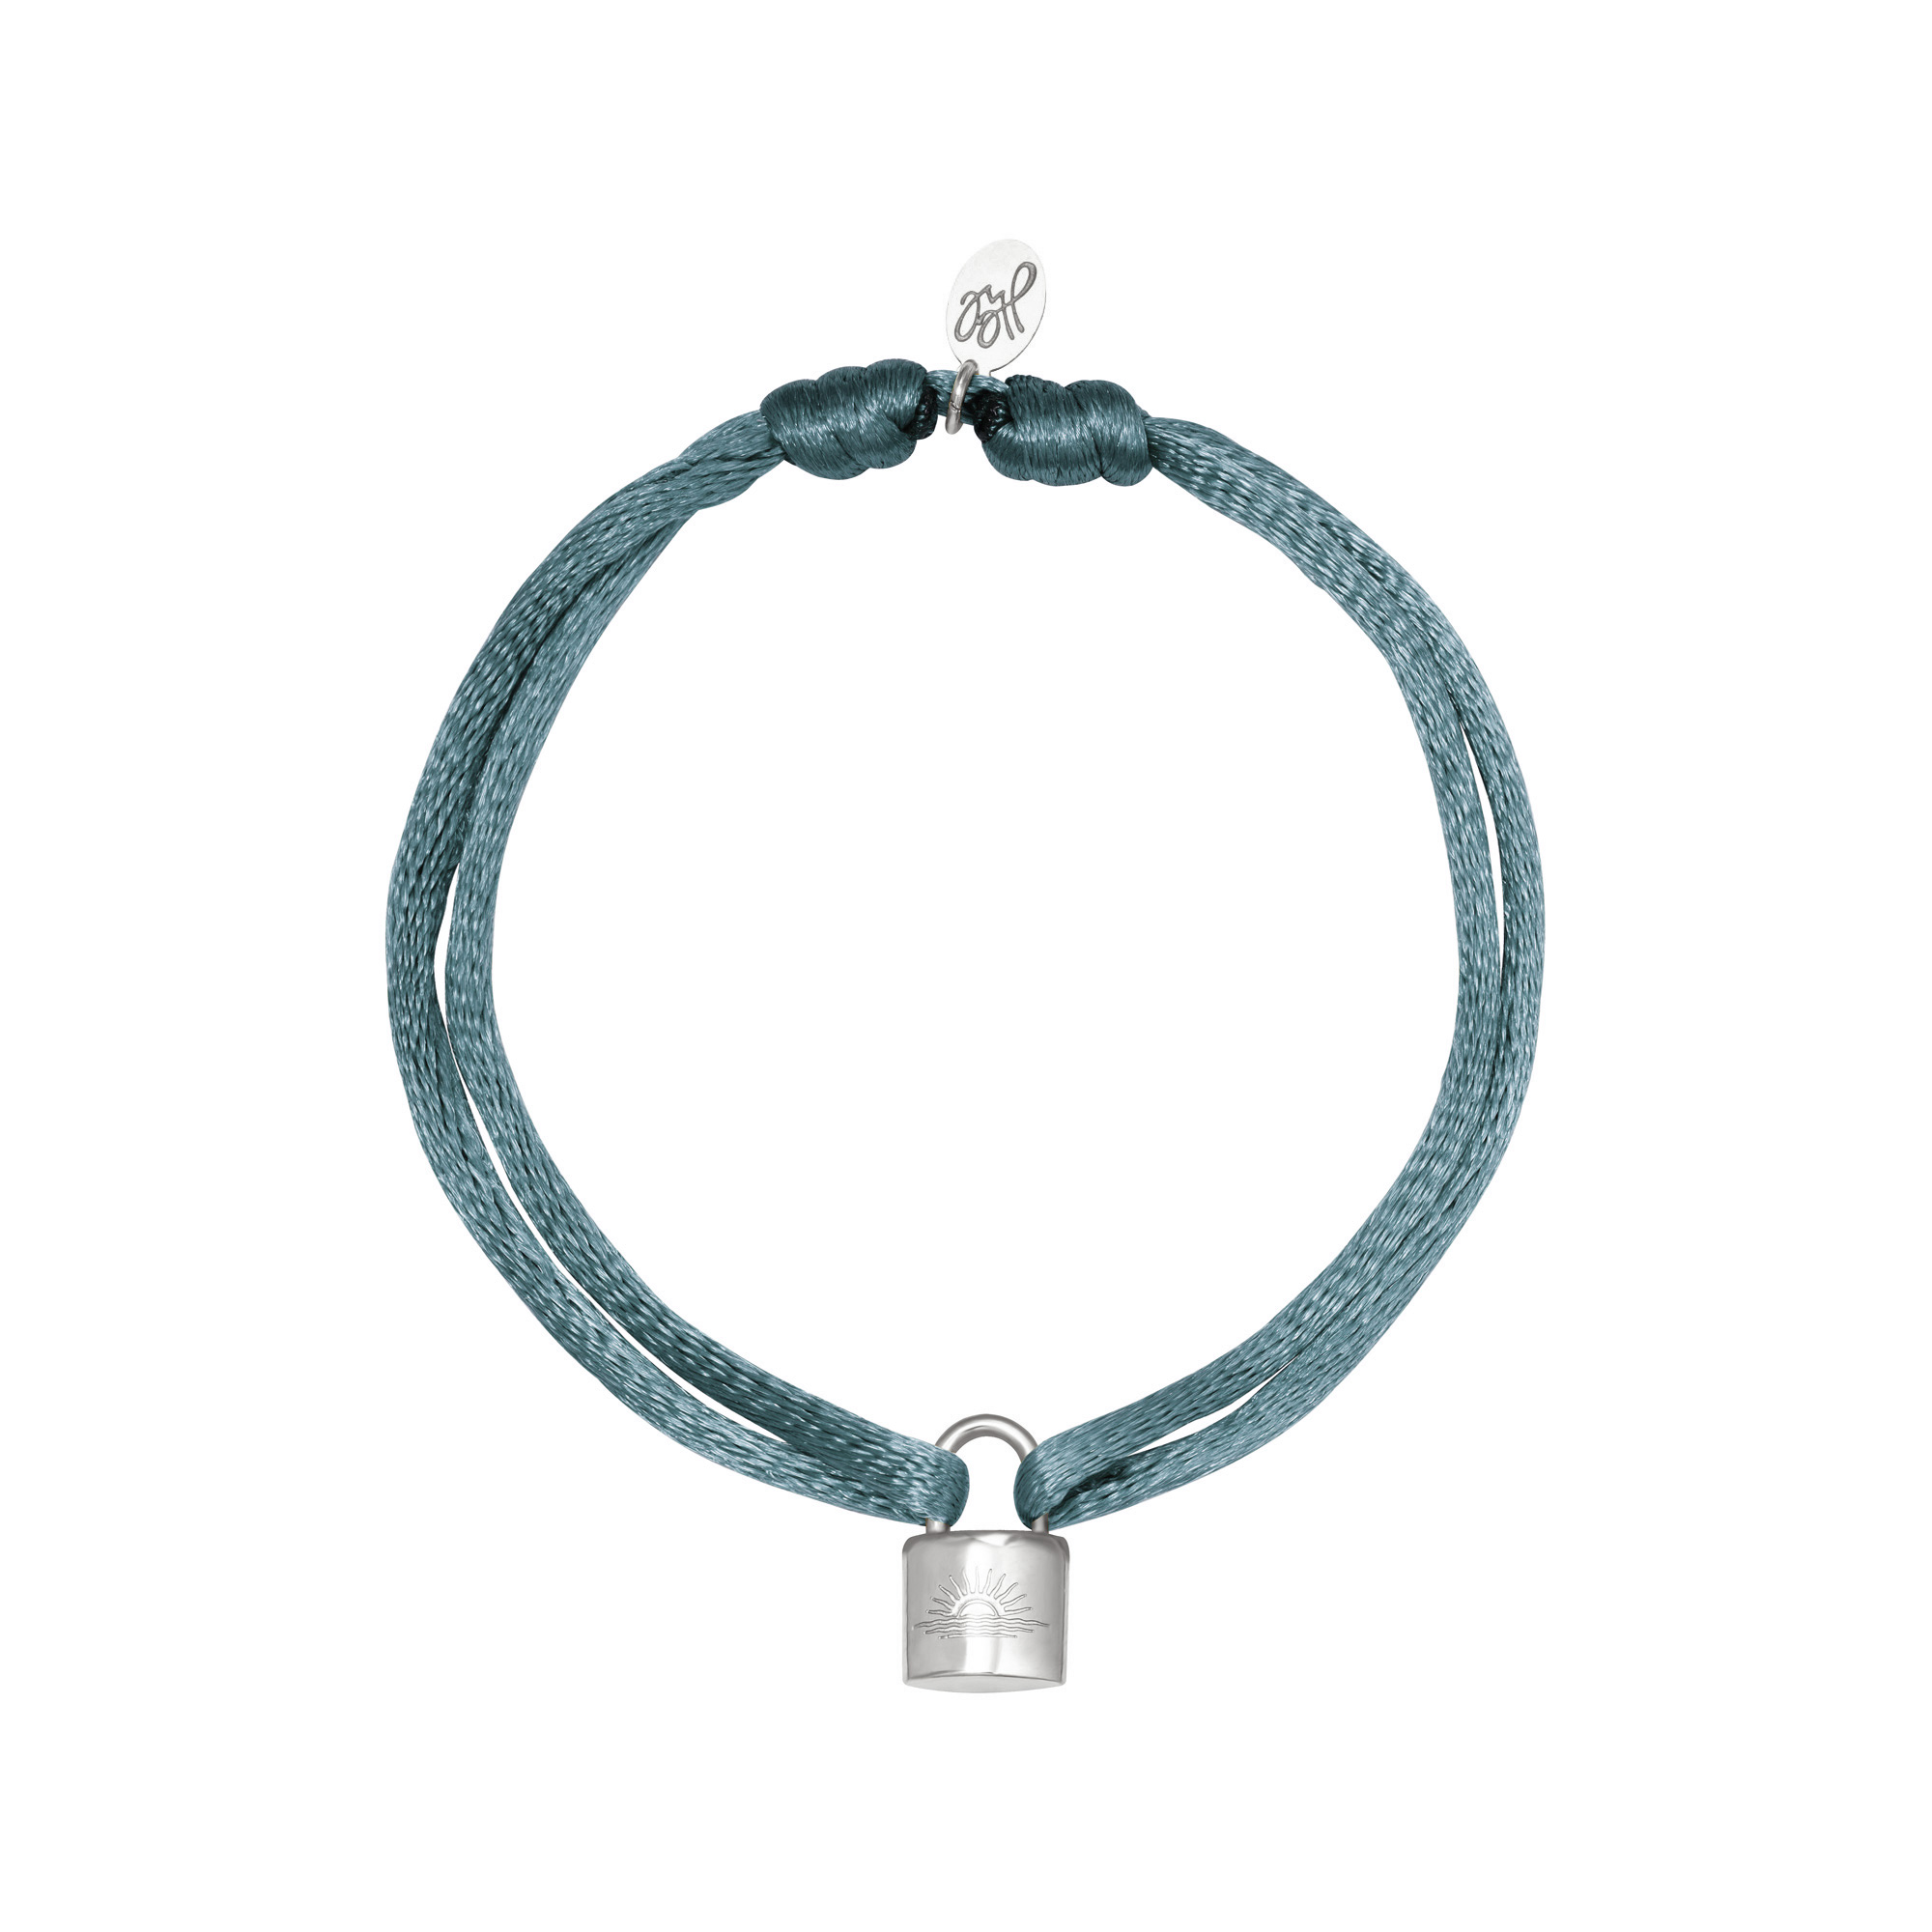 Armband satin lock